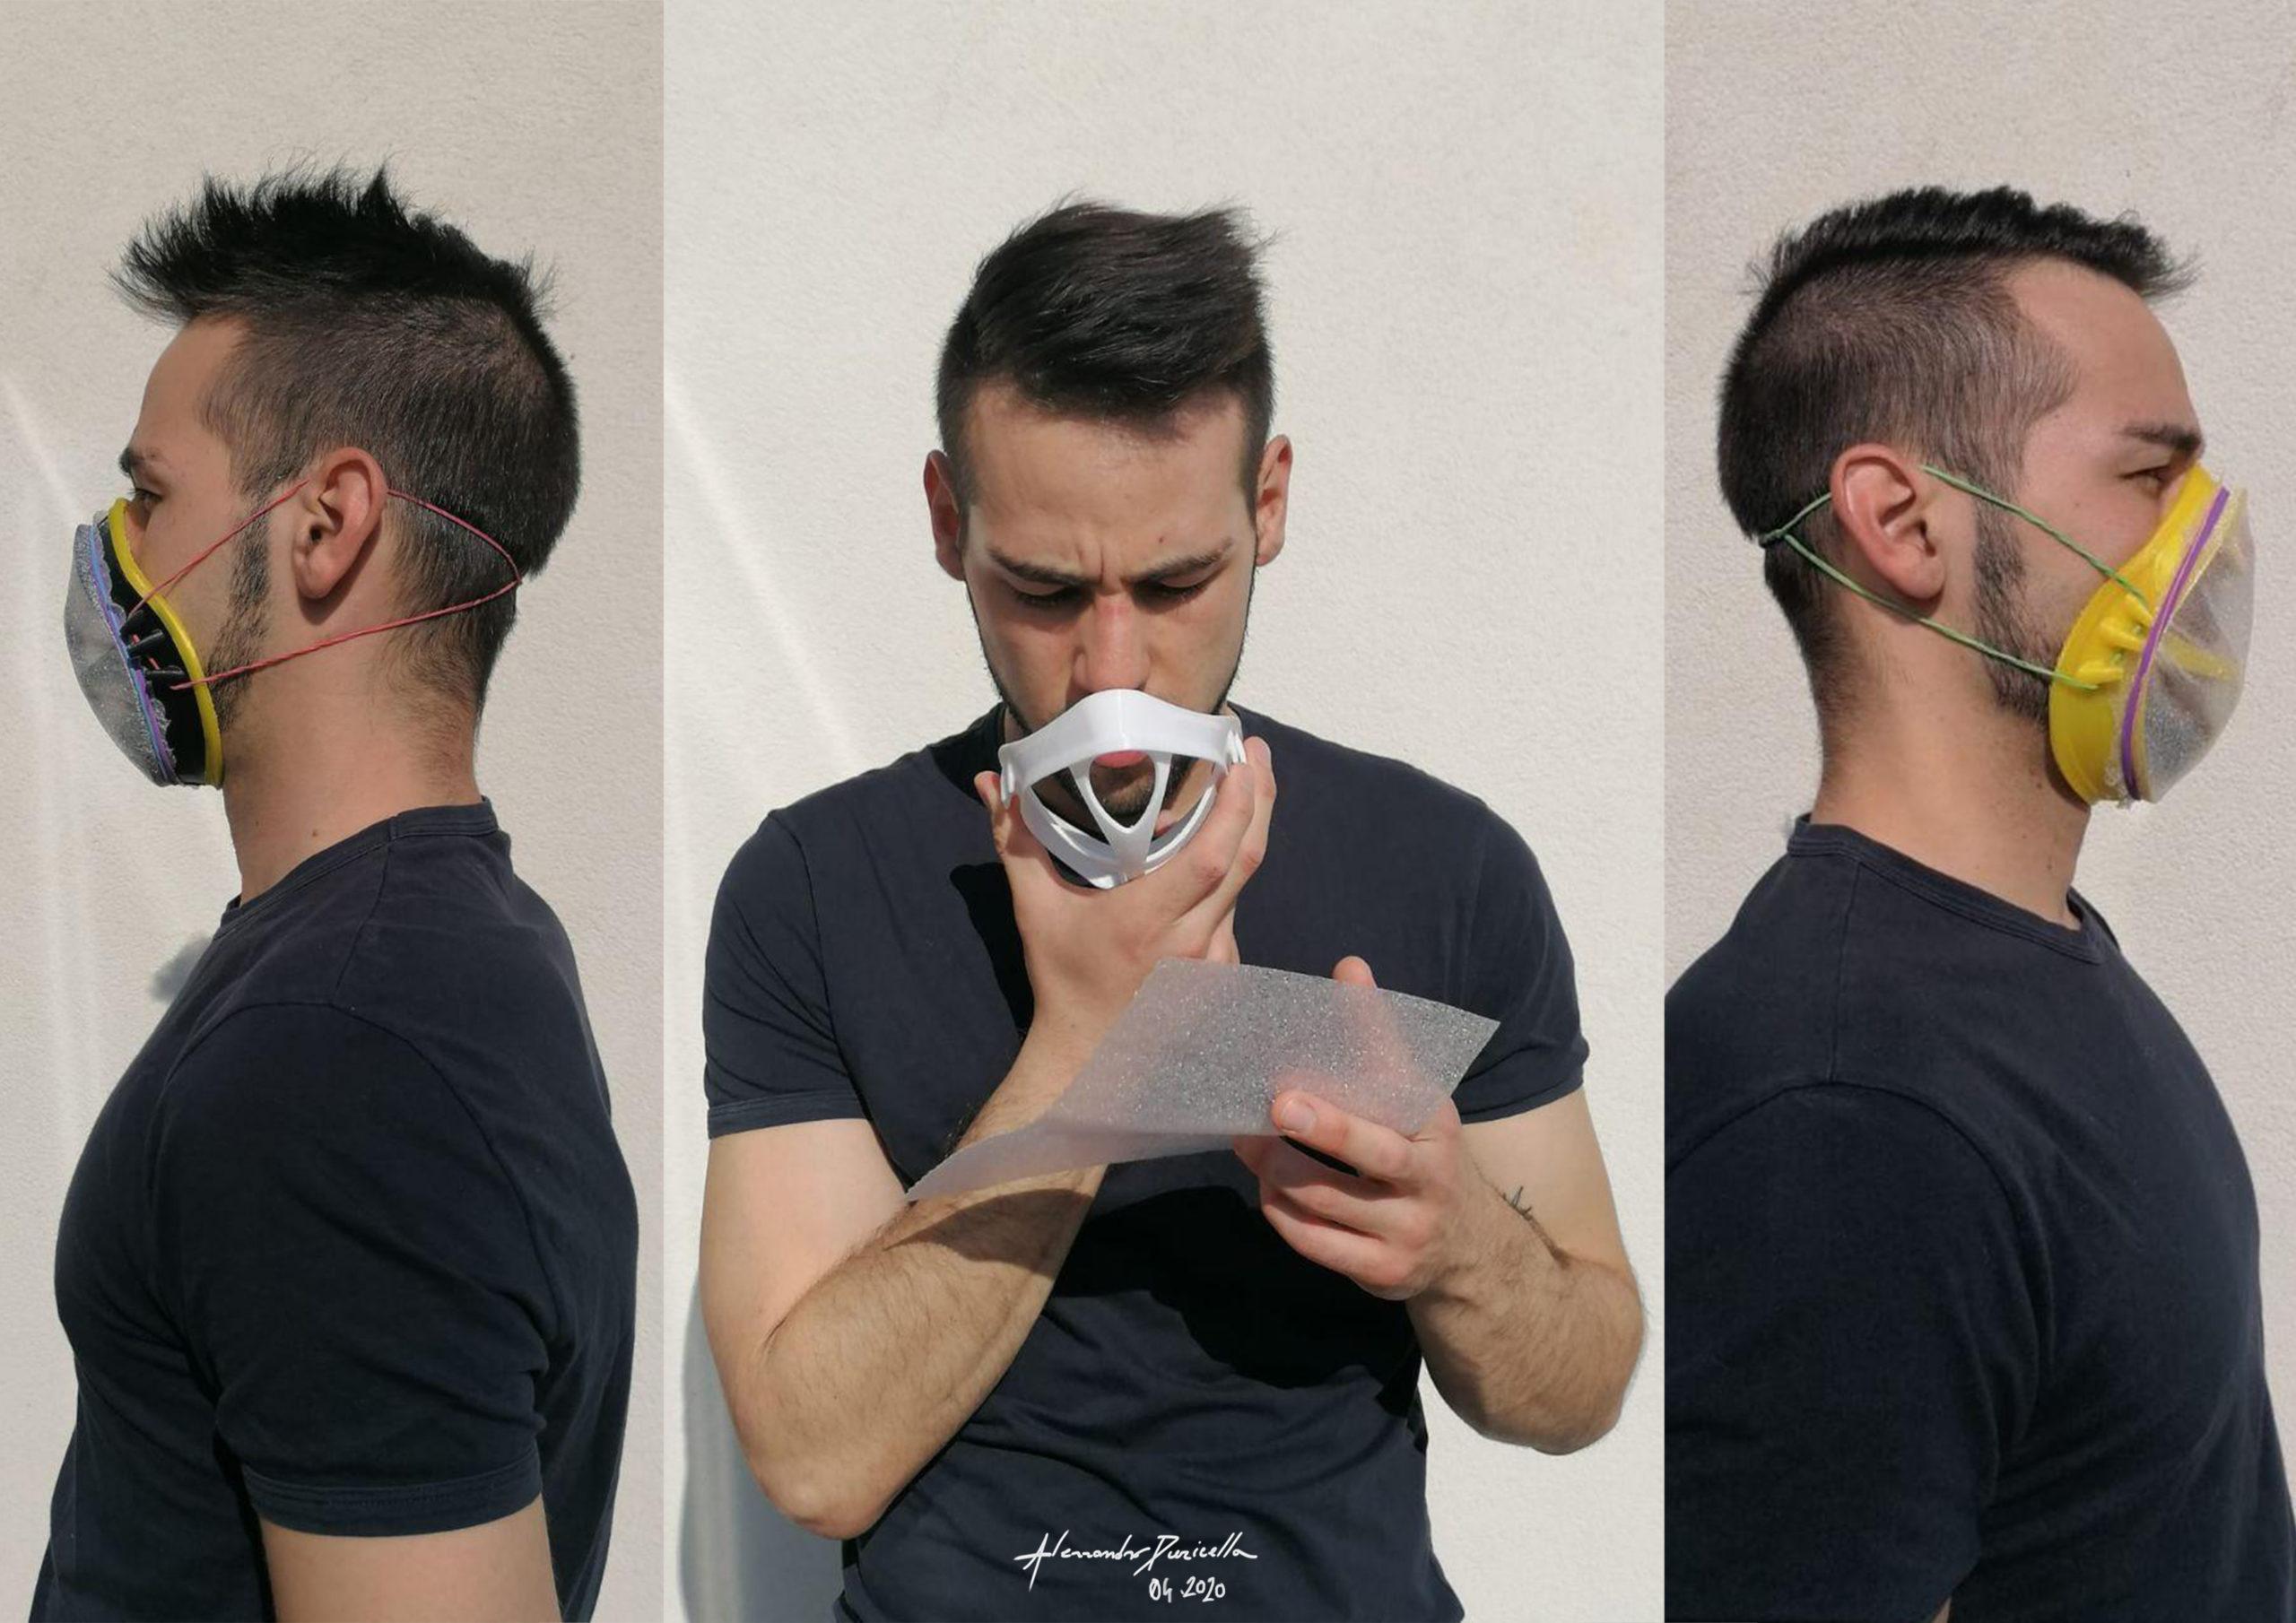 Alessandro puricella mascherina mikeferd img